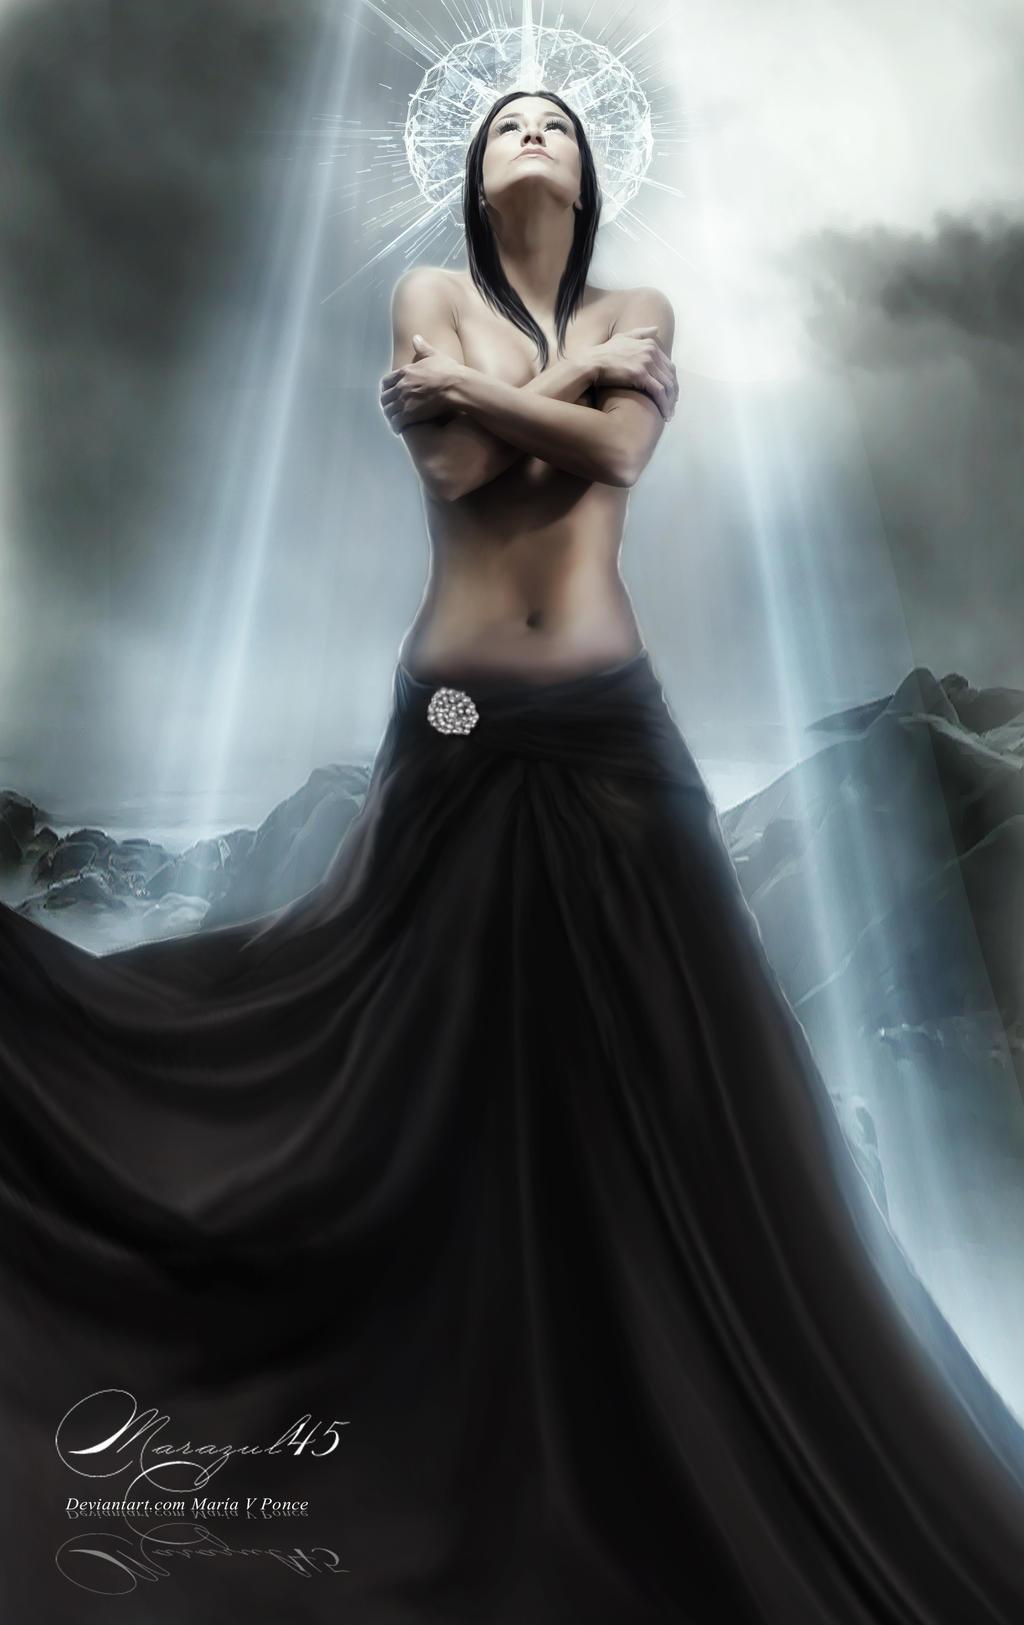 Mysticism by Marazul45